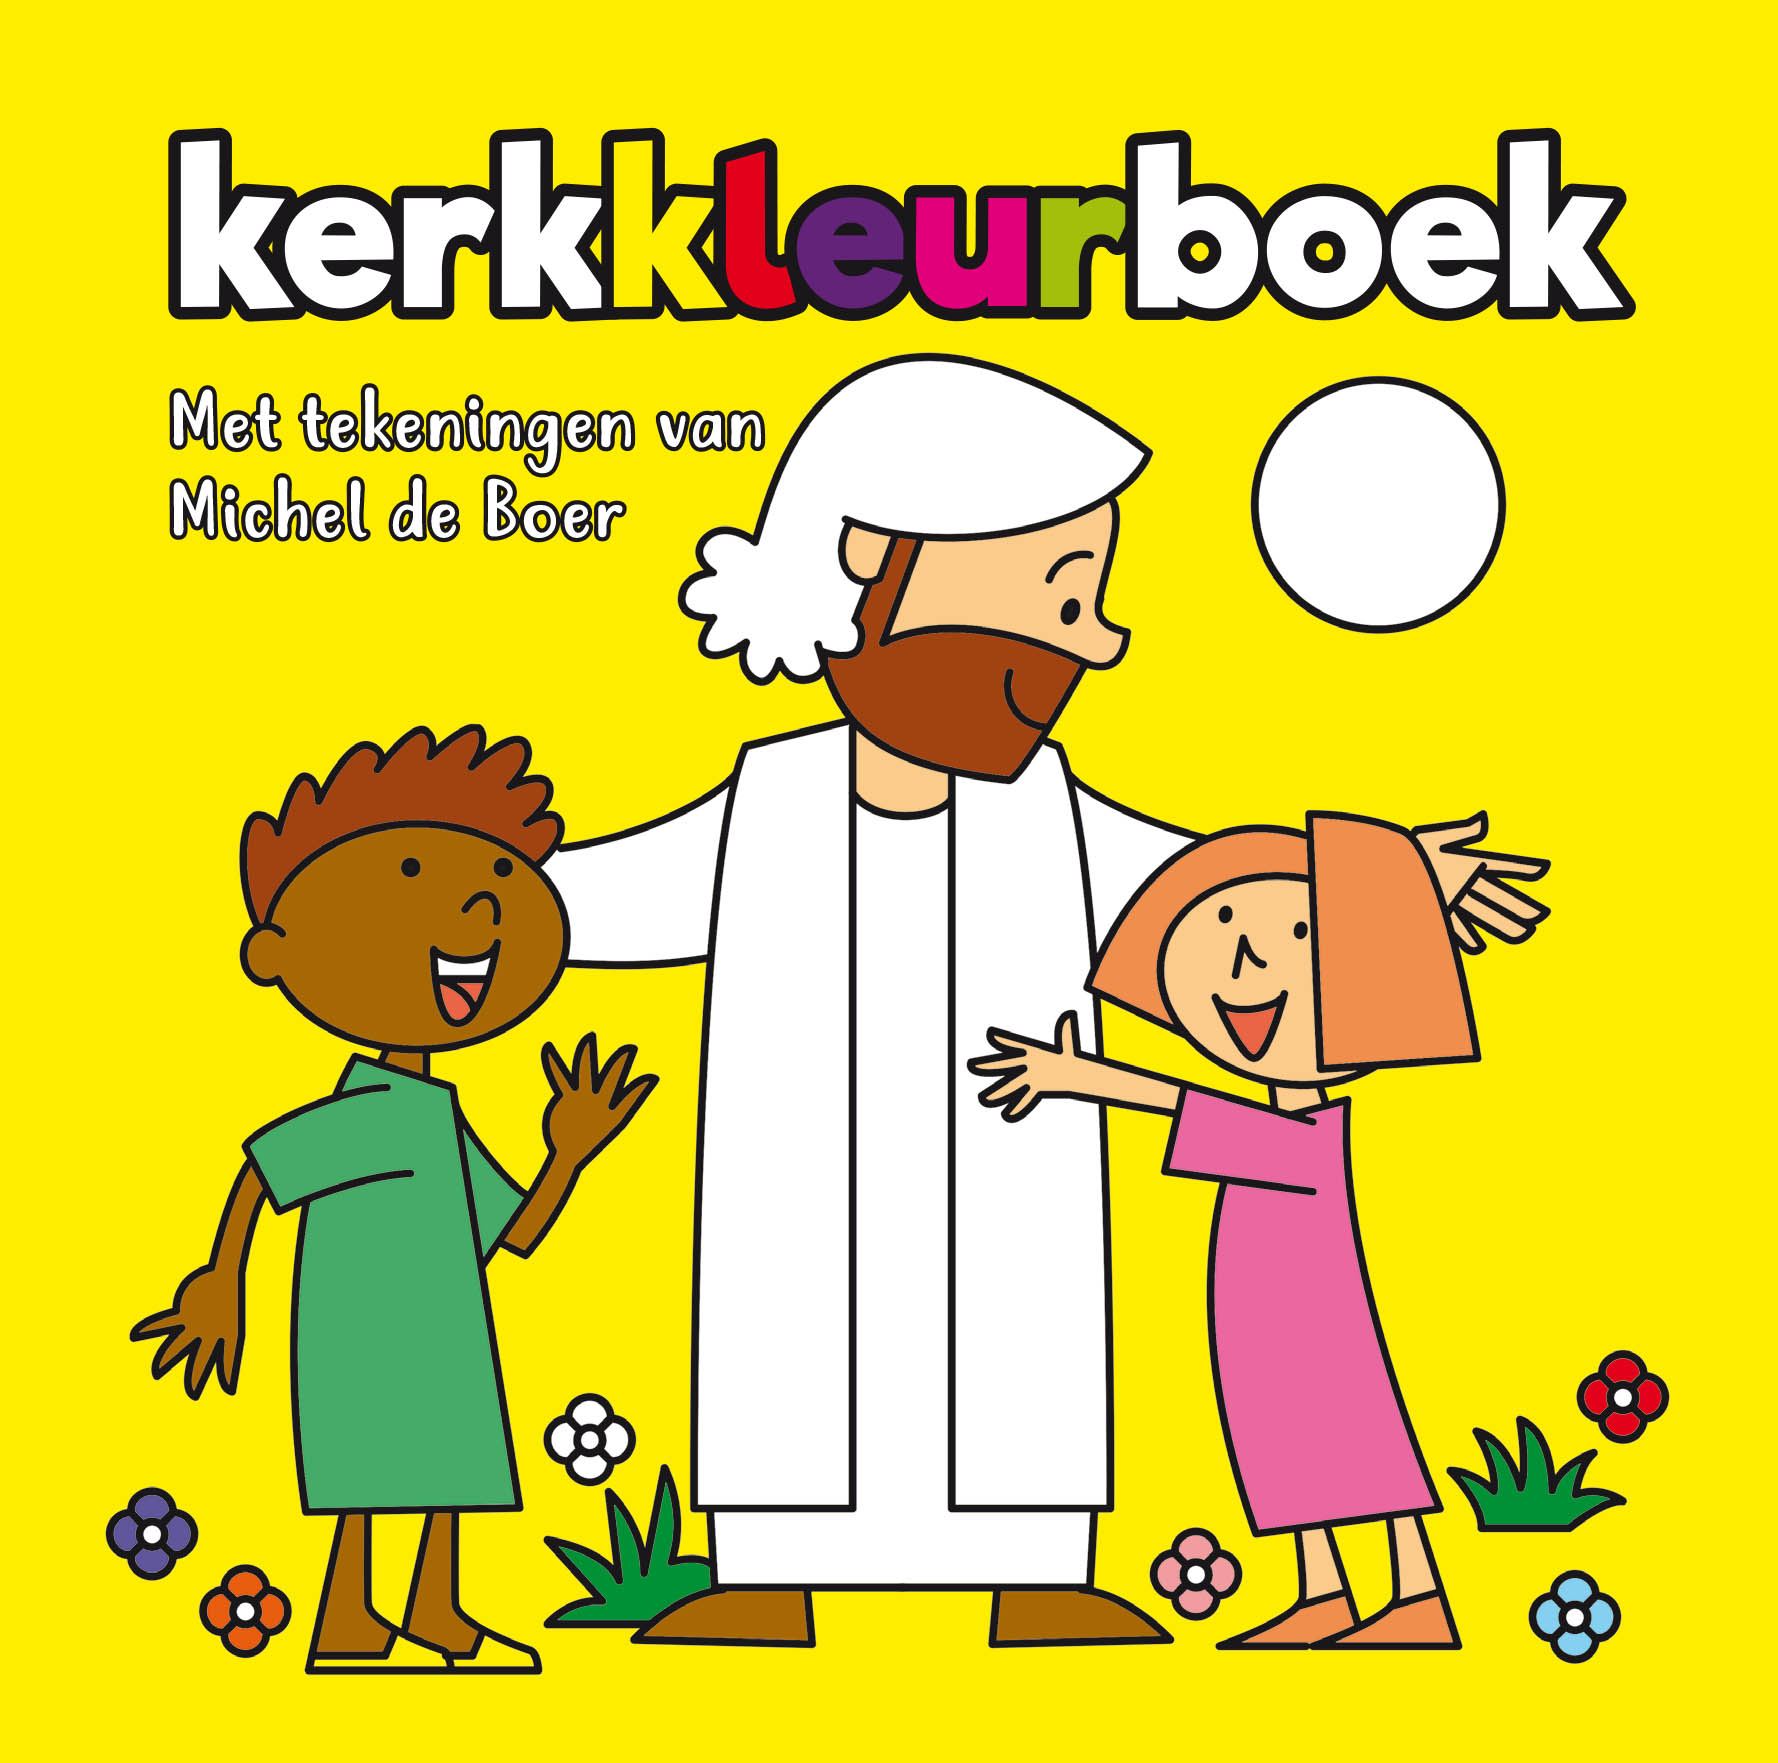 Kerkkleurboek